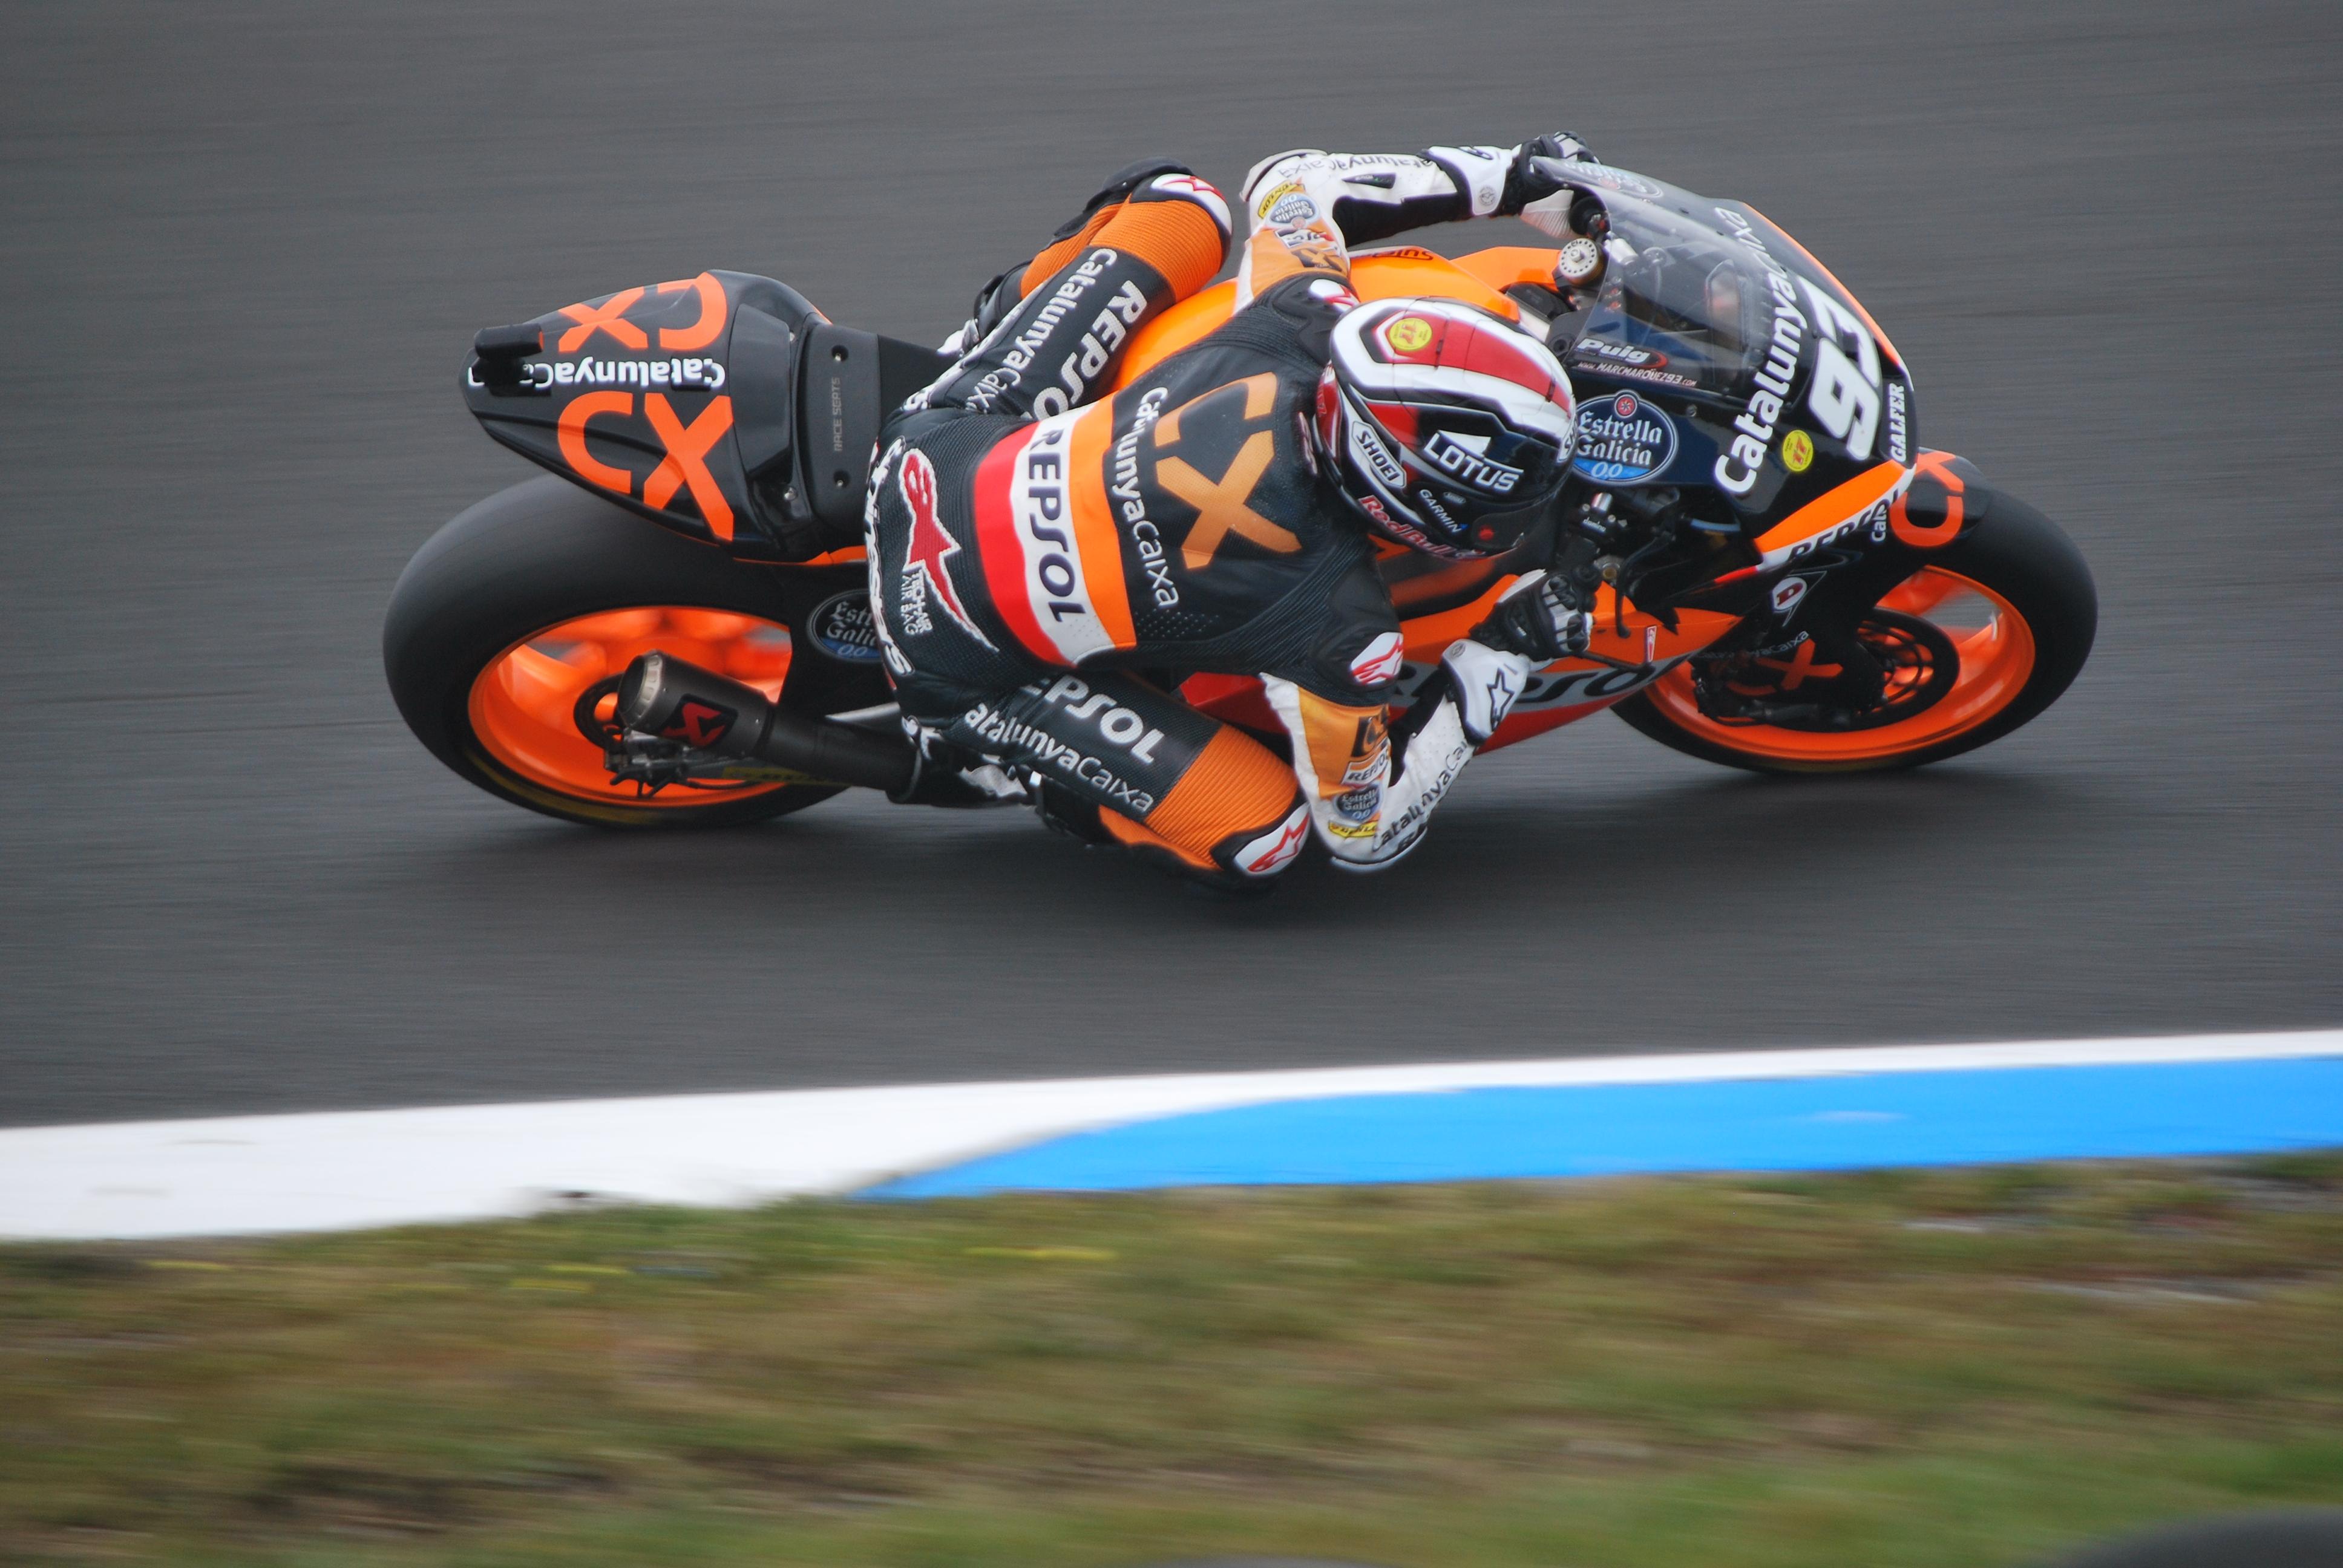 File:Marc Marquez Moto2 2012.jpg - Wikimedia Commons